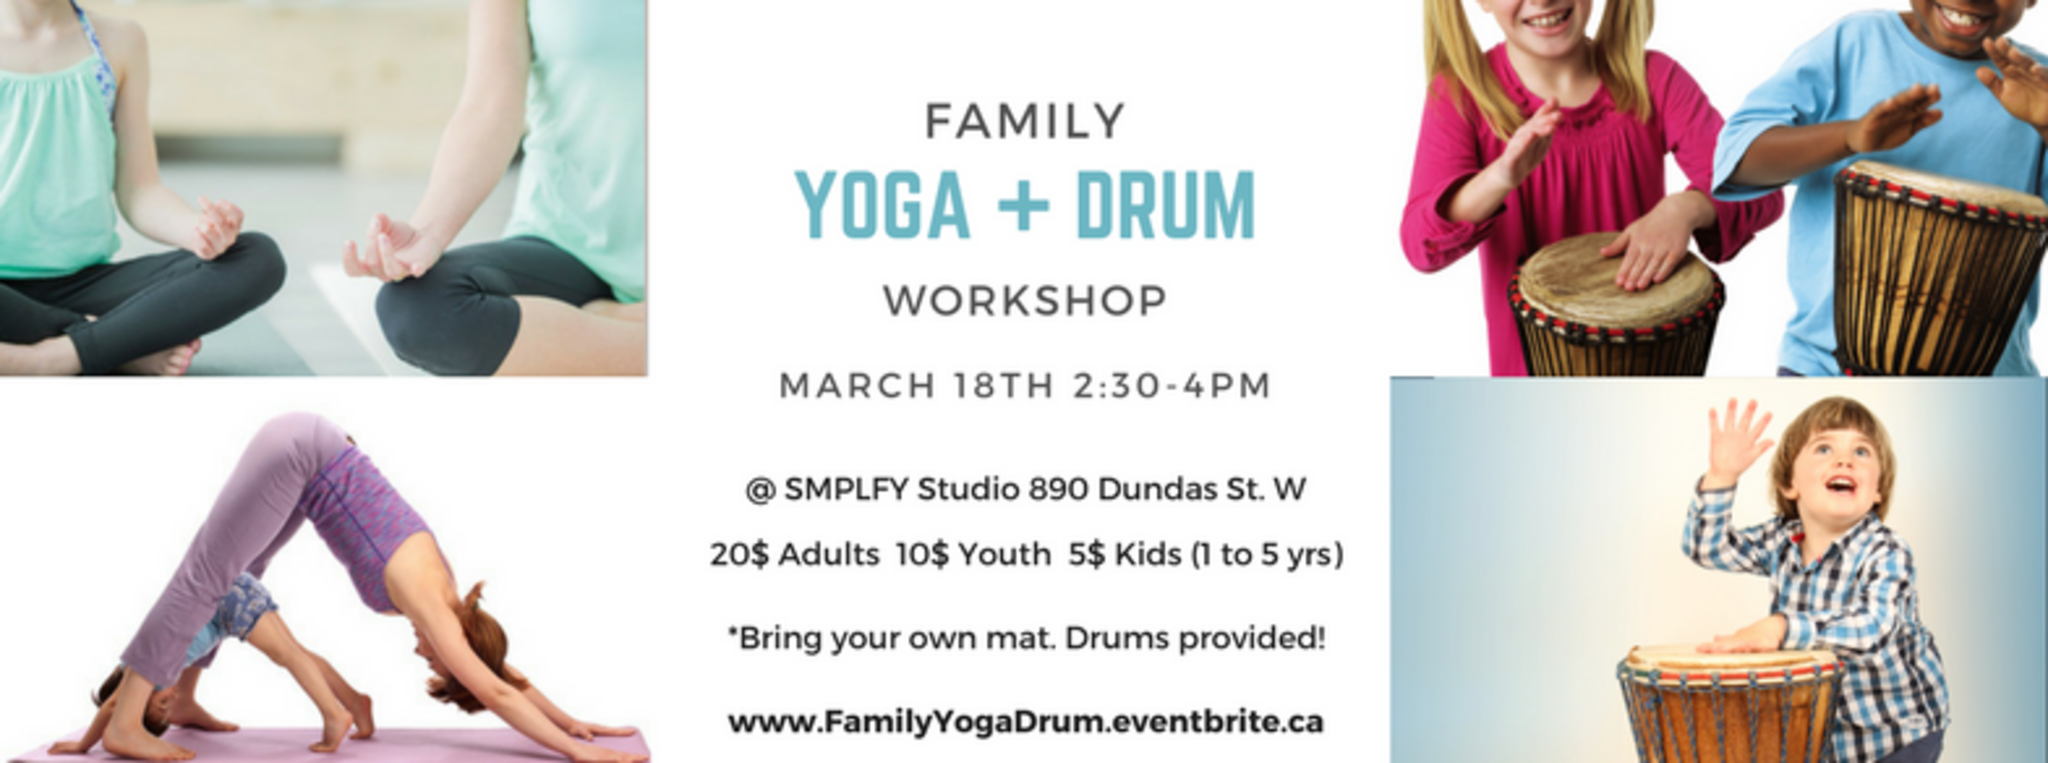 Family Yoga & Drum Workshop